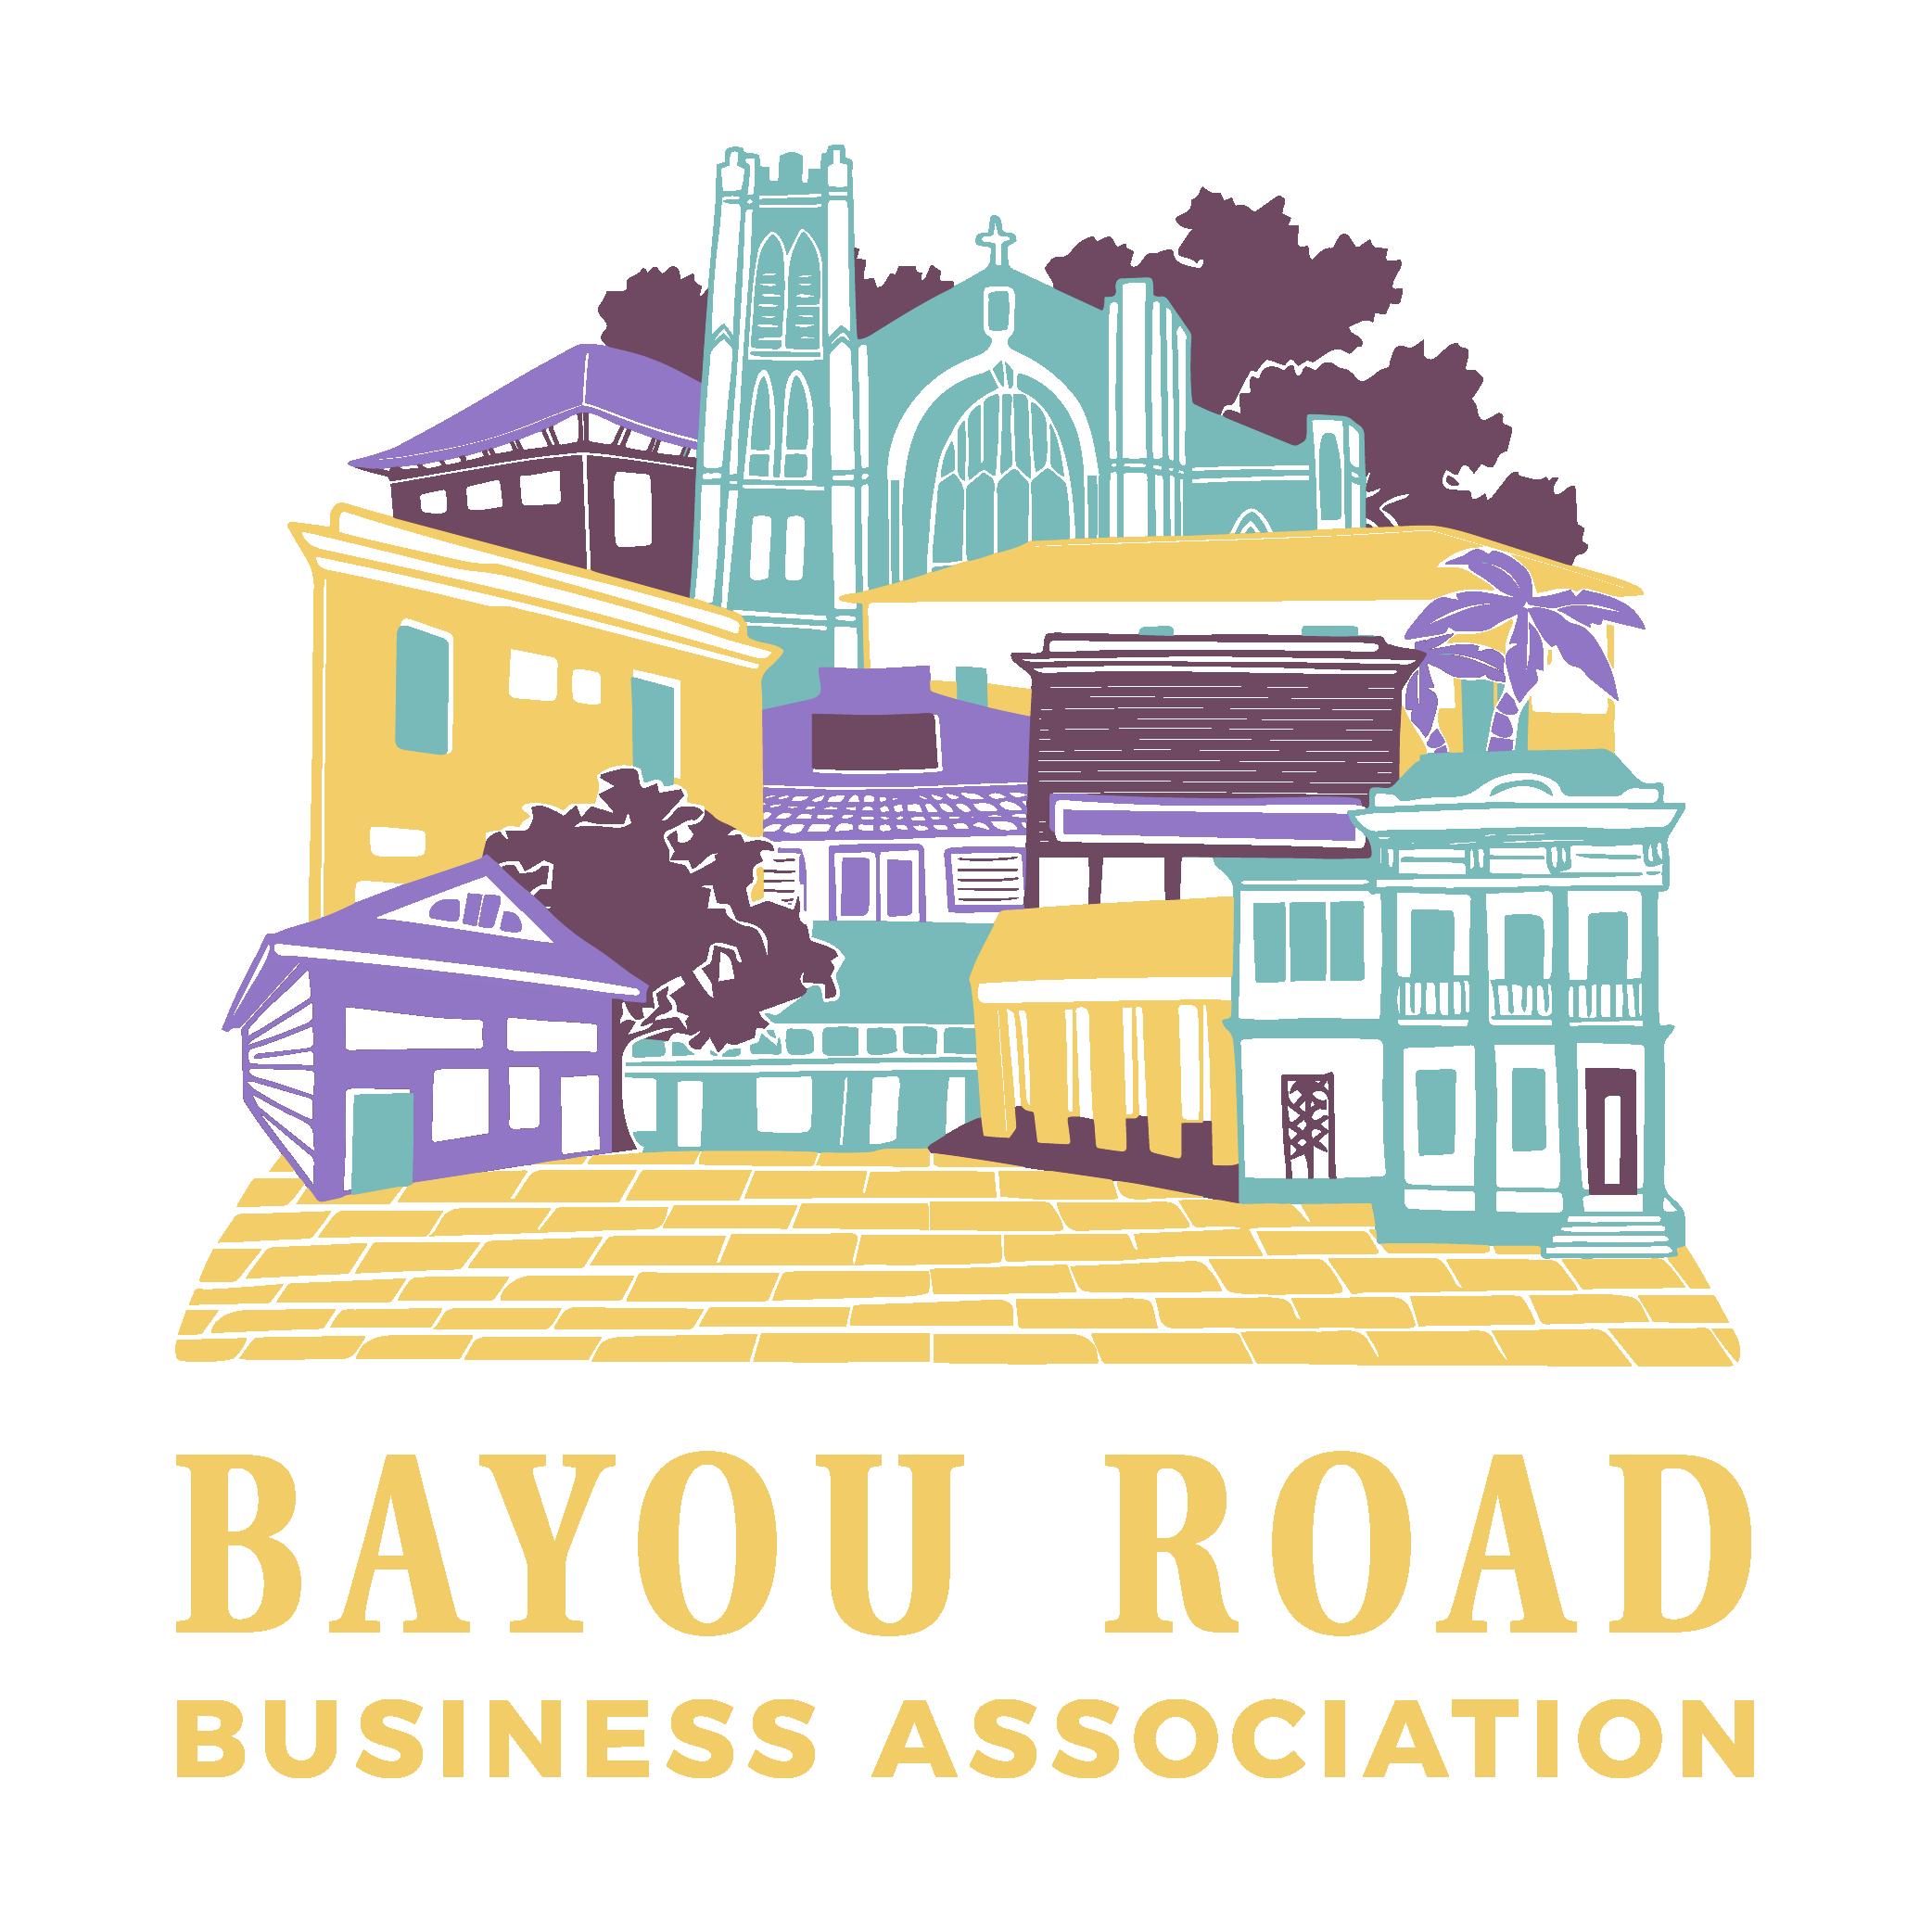 bayou road new orleans logo